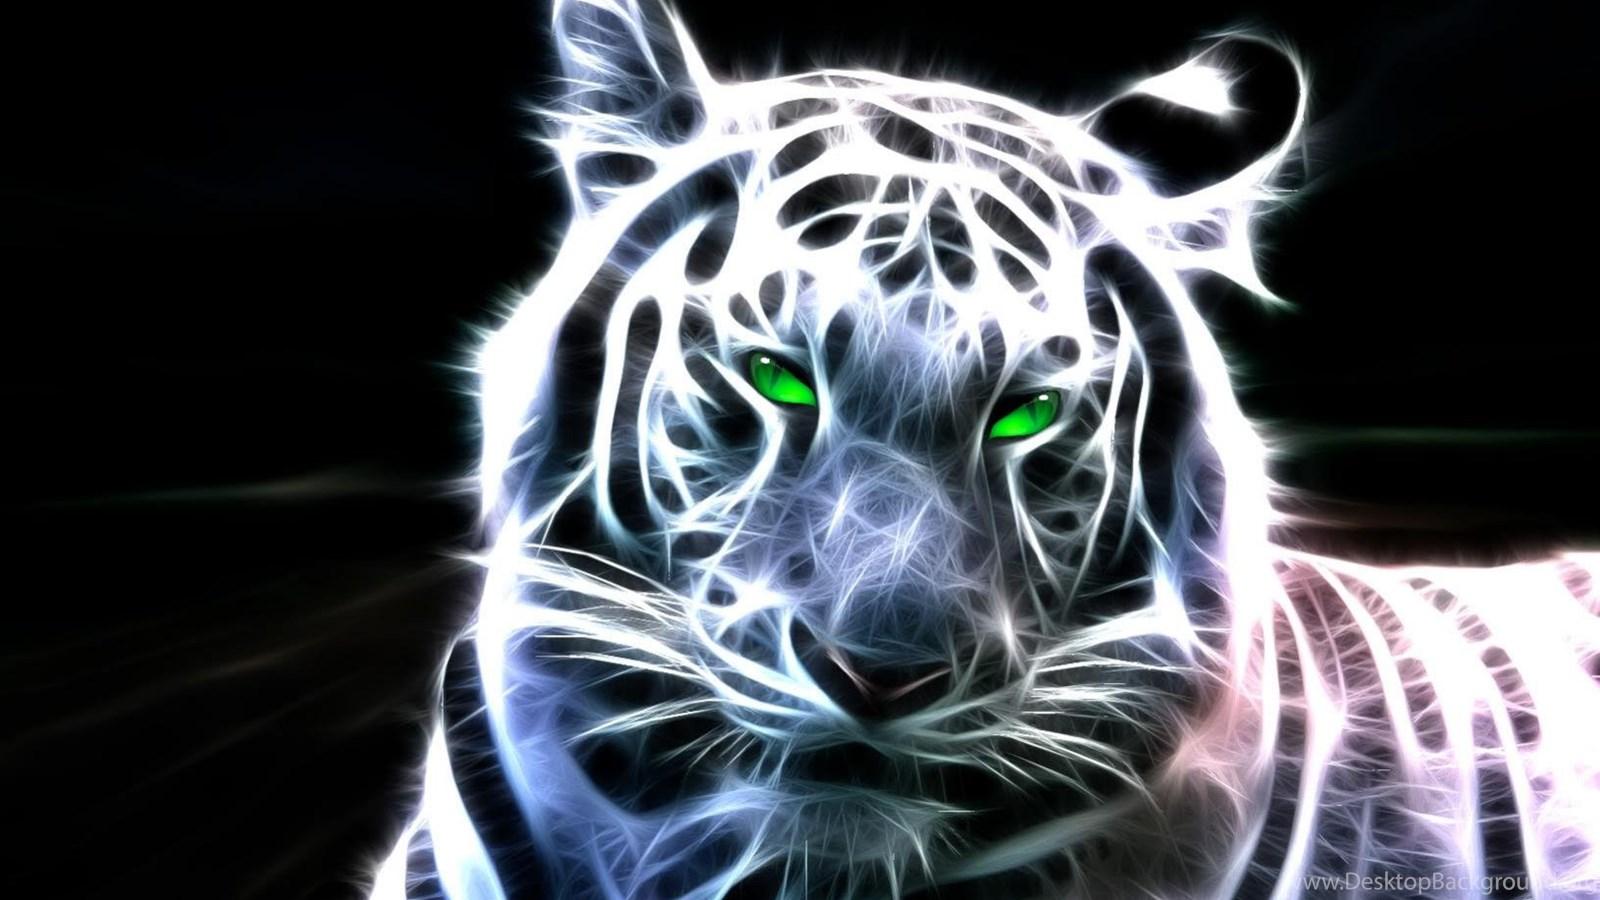 cool tiger backgrounds wallpapers cave desktop background